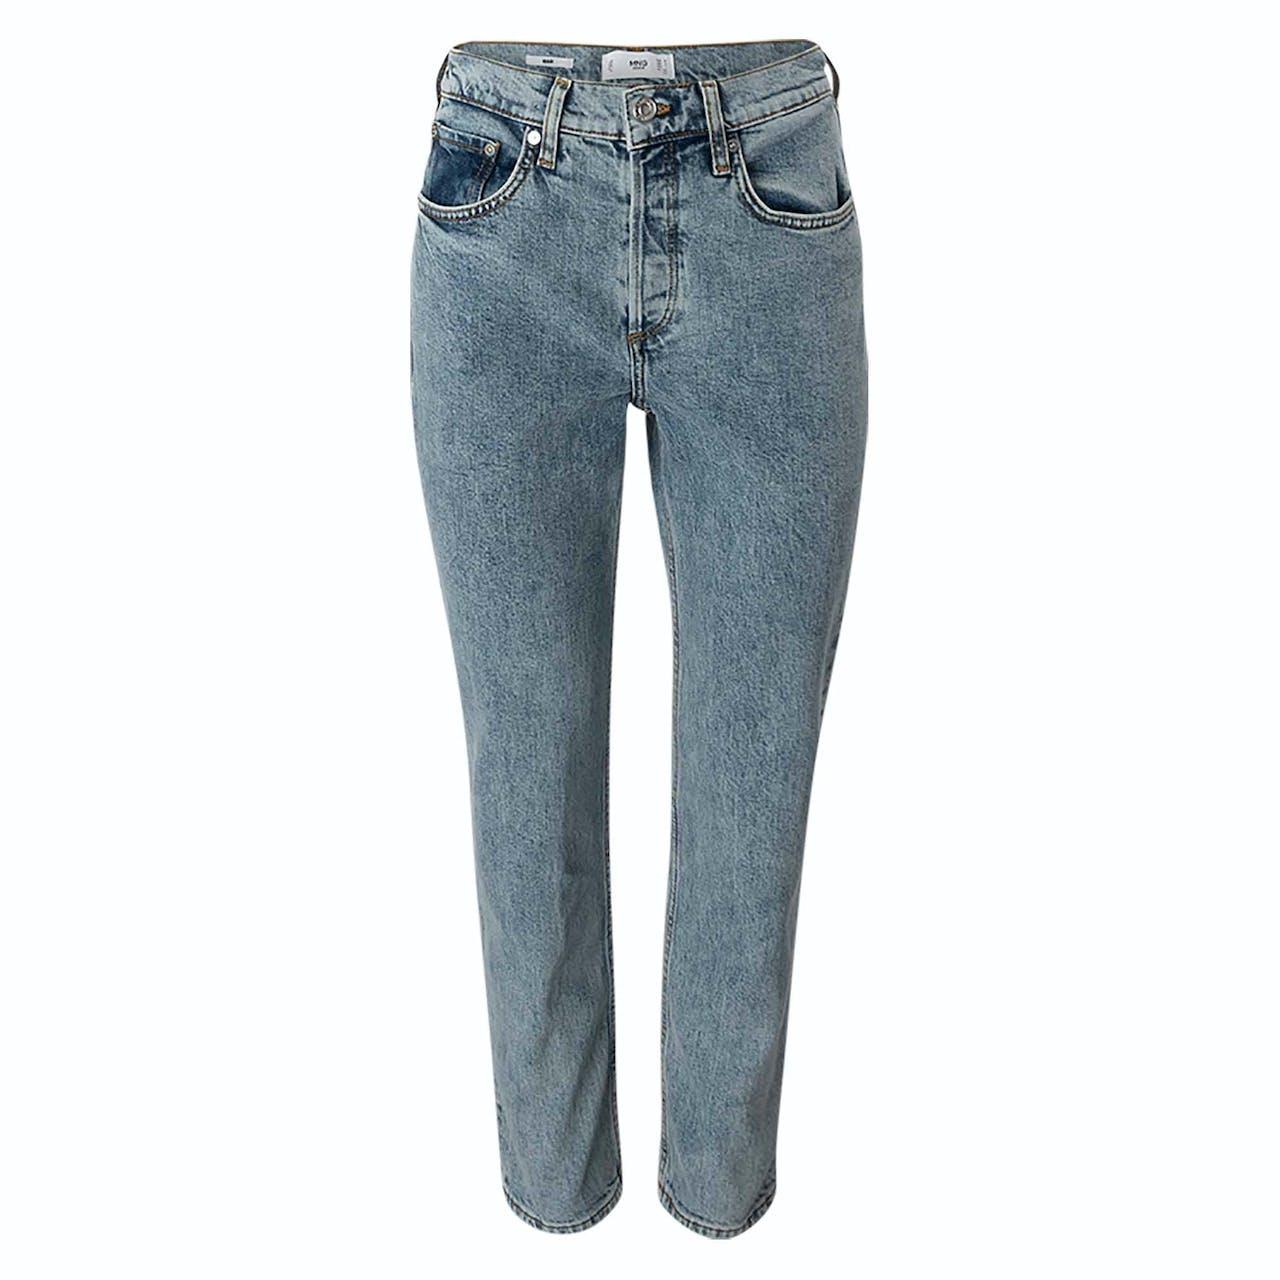 Jeans - Slim Comfort - Cropped